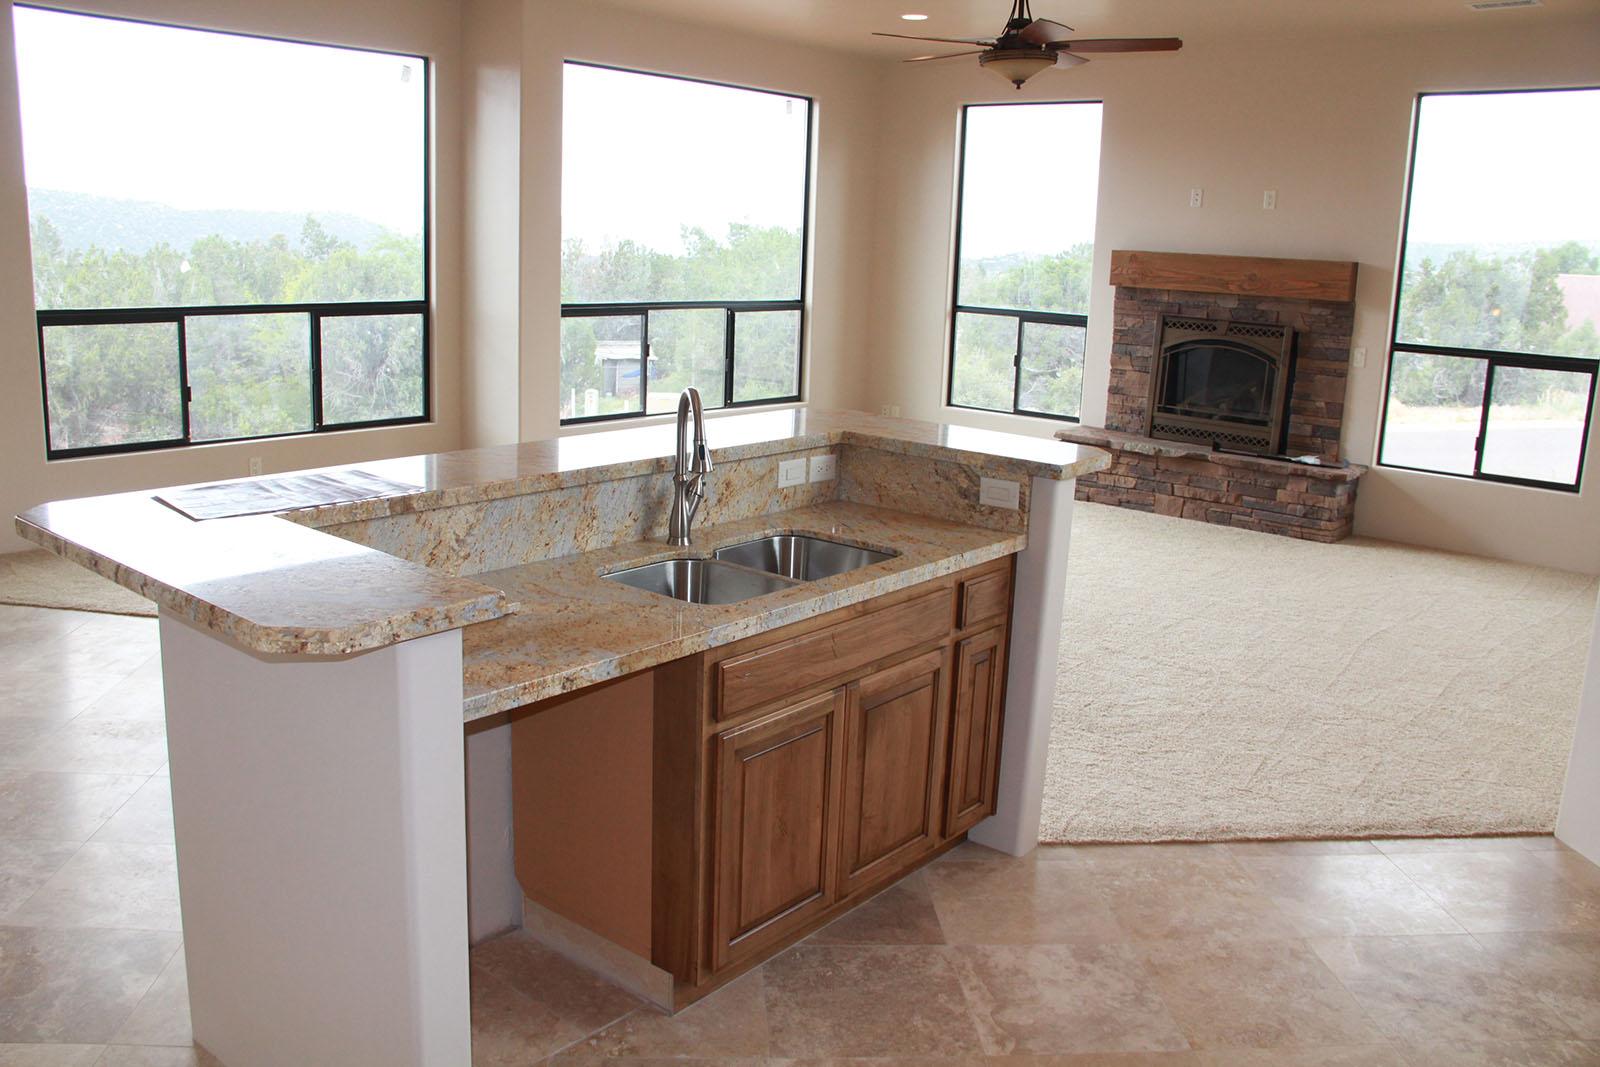 530-windsong-torel-custom-homes-sedona-arizona-0150-jpg